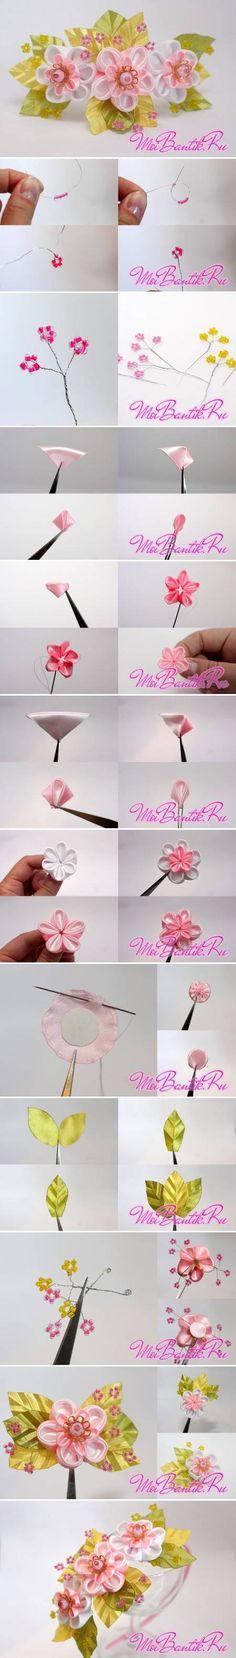 DIY Golden Sakura Ribbon Flower DIY Golden Sakura Ribbon Flower